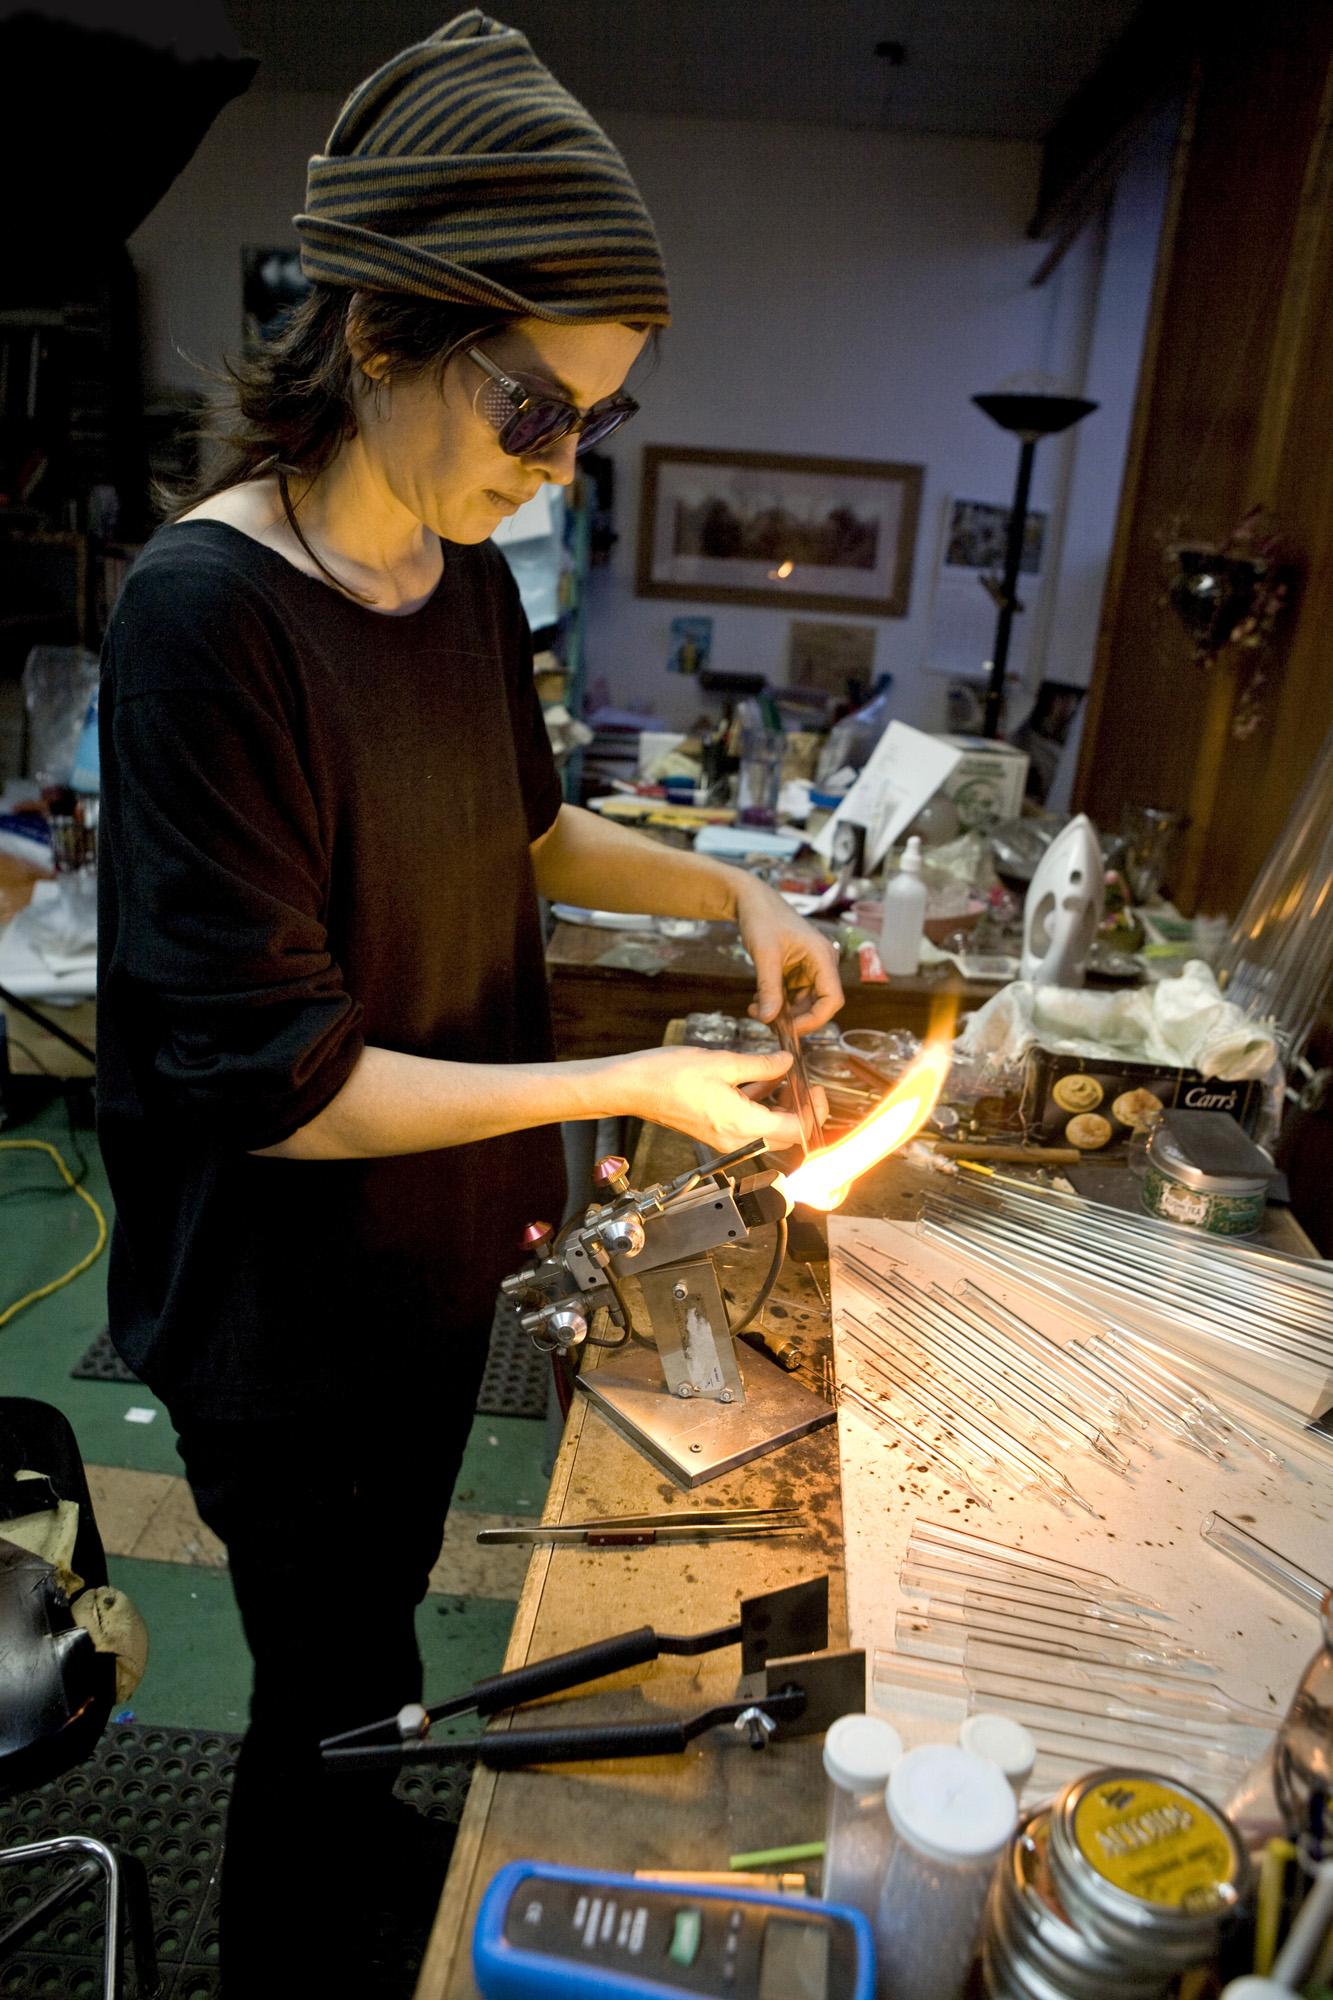 Vanessa Yanow: Montreal Artist-at-Work  – montrealgazette.com, April 8, 2014